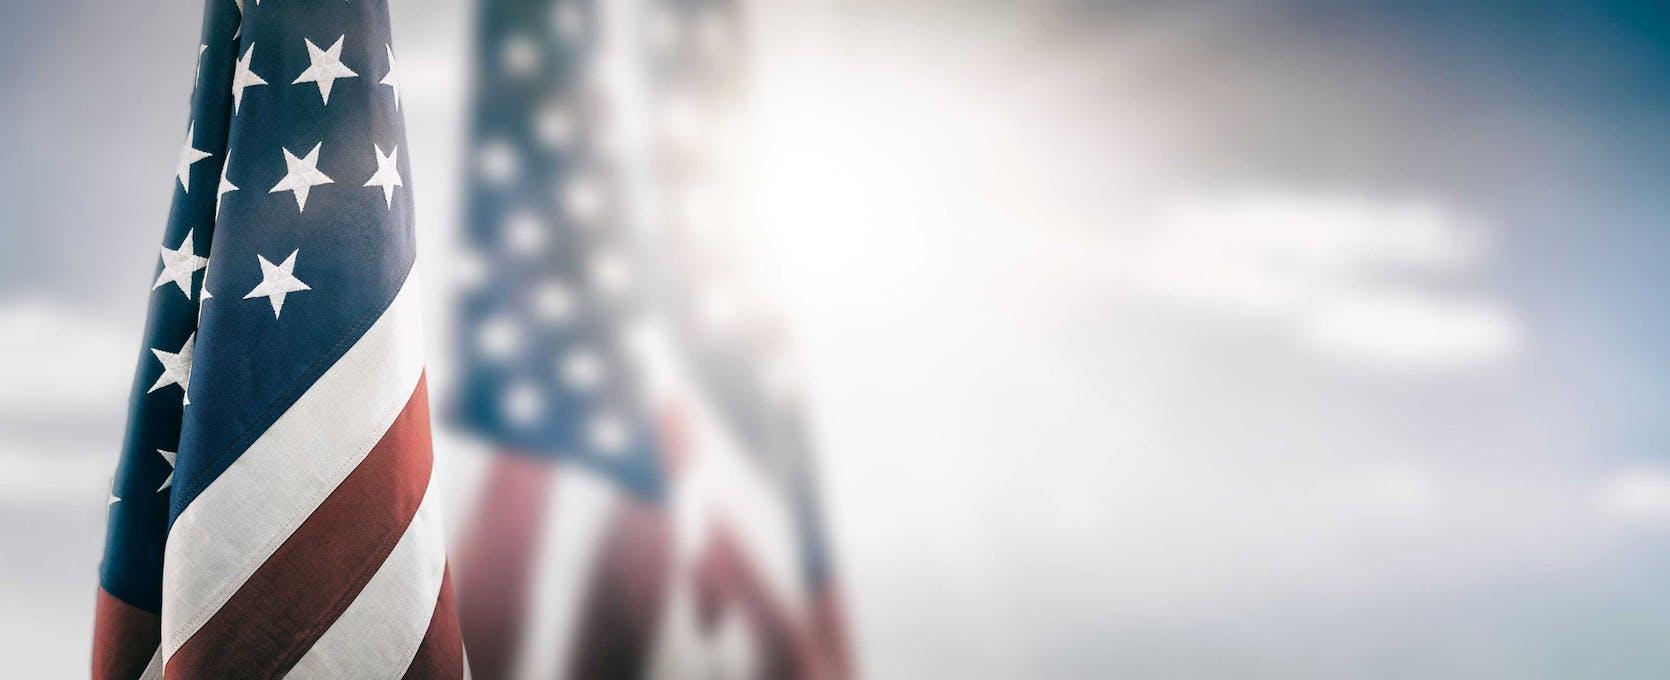 American flag in the sun